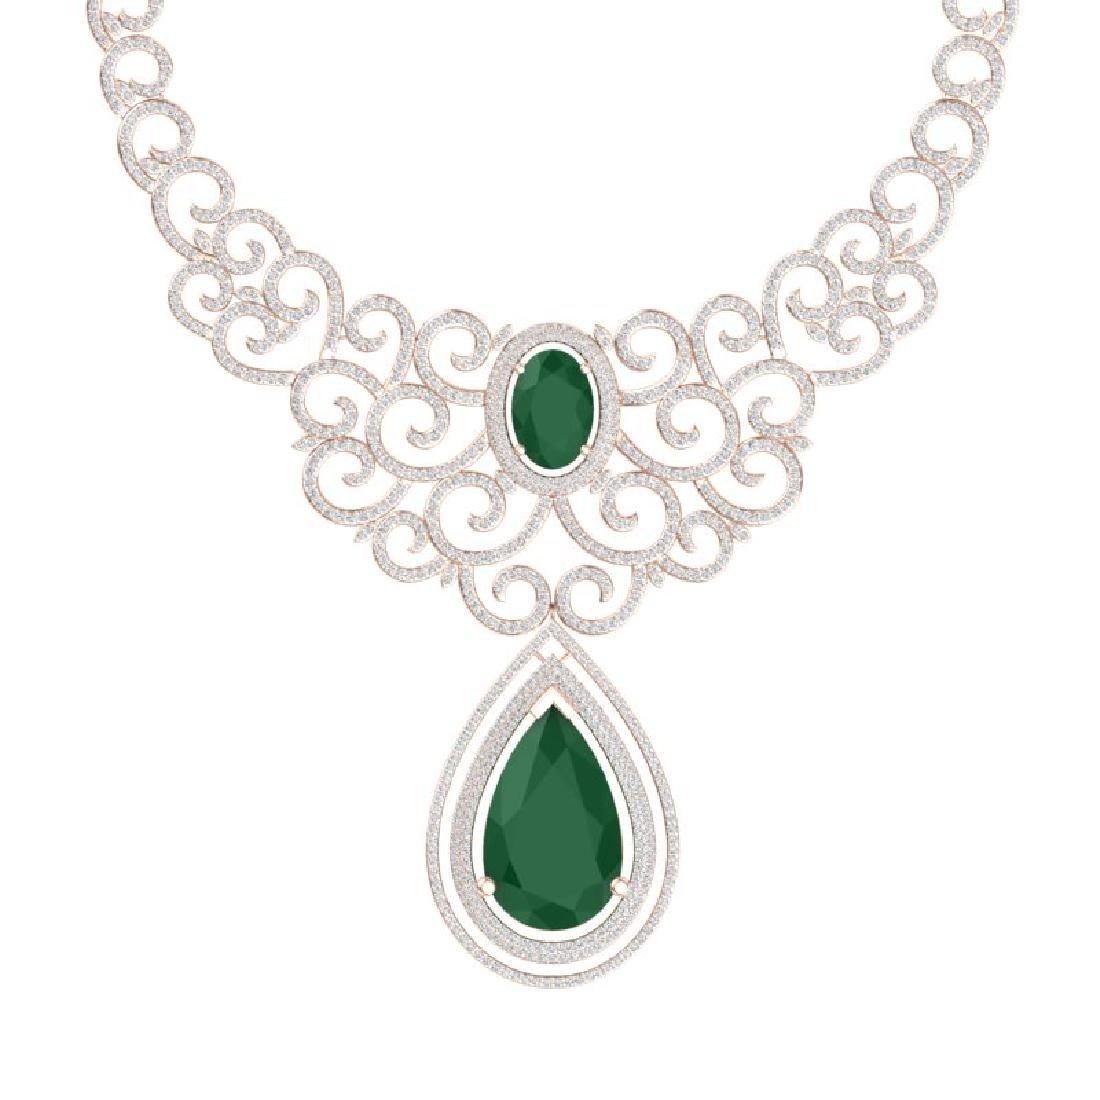 87.52 CTW Royalty Emerald & VS Diamond Necklace 18K - 2